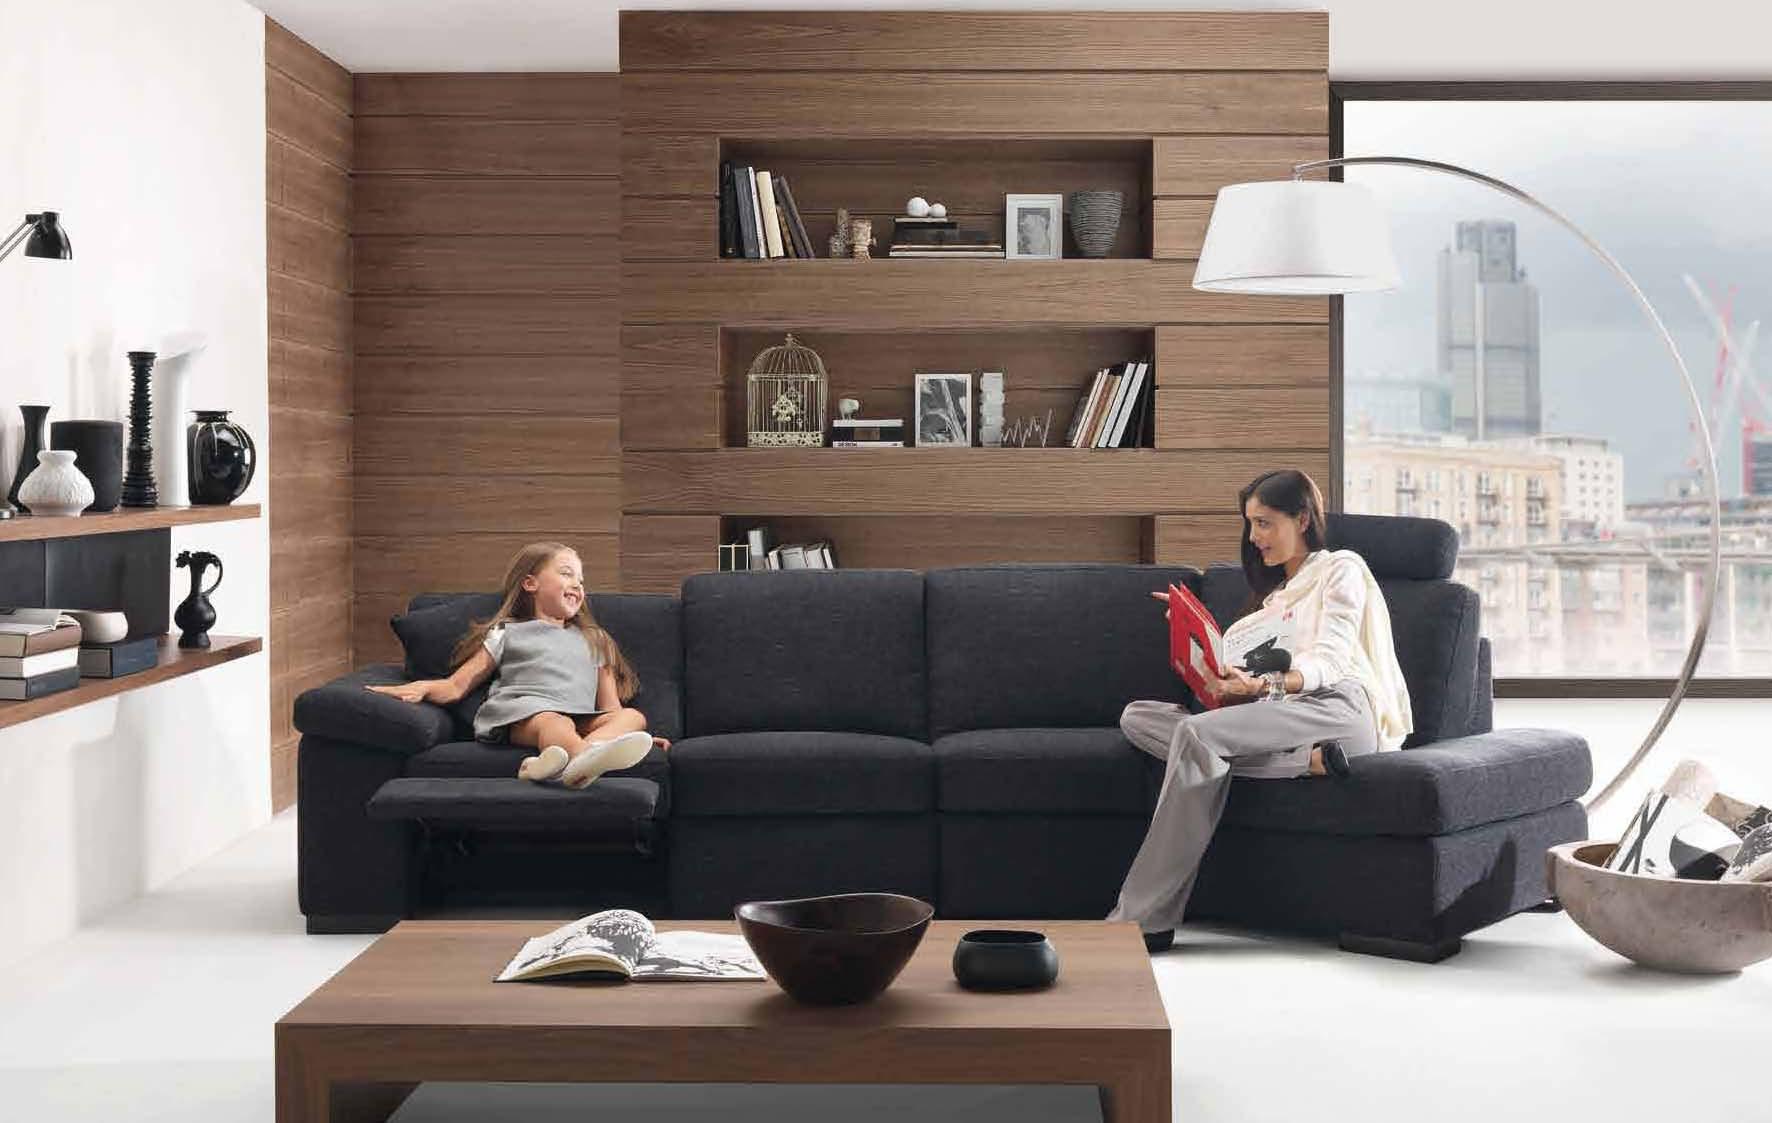 American-style apartment living room design renderings